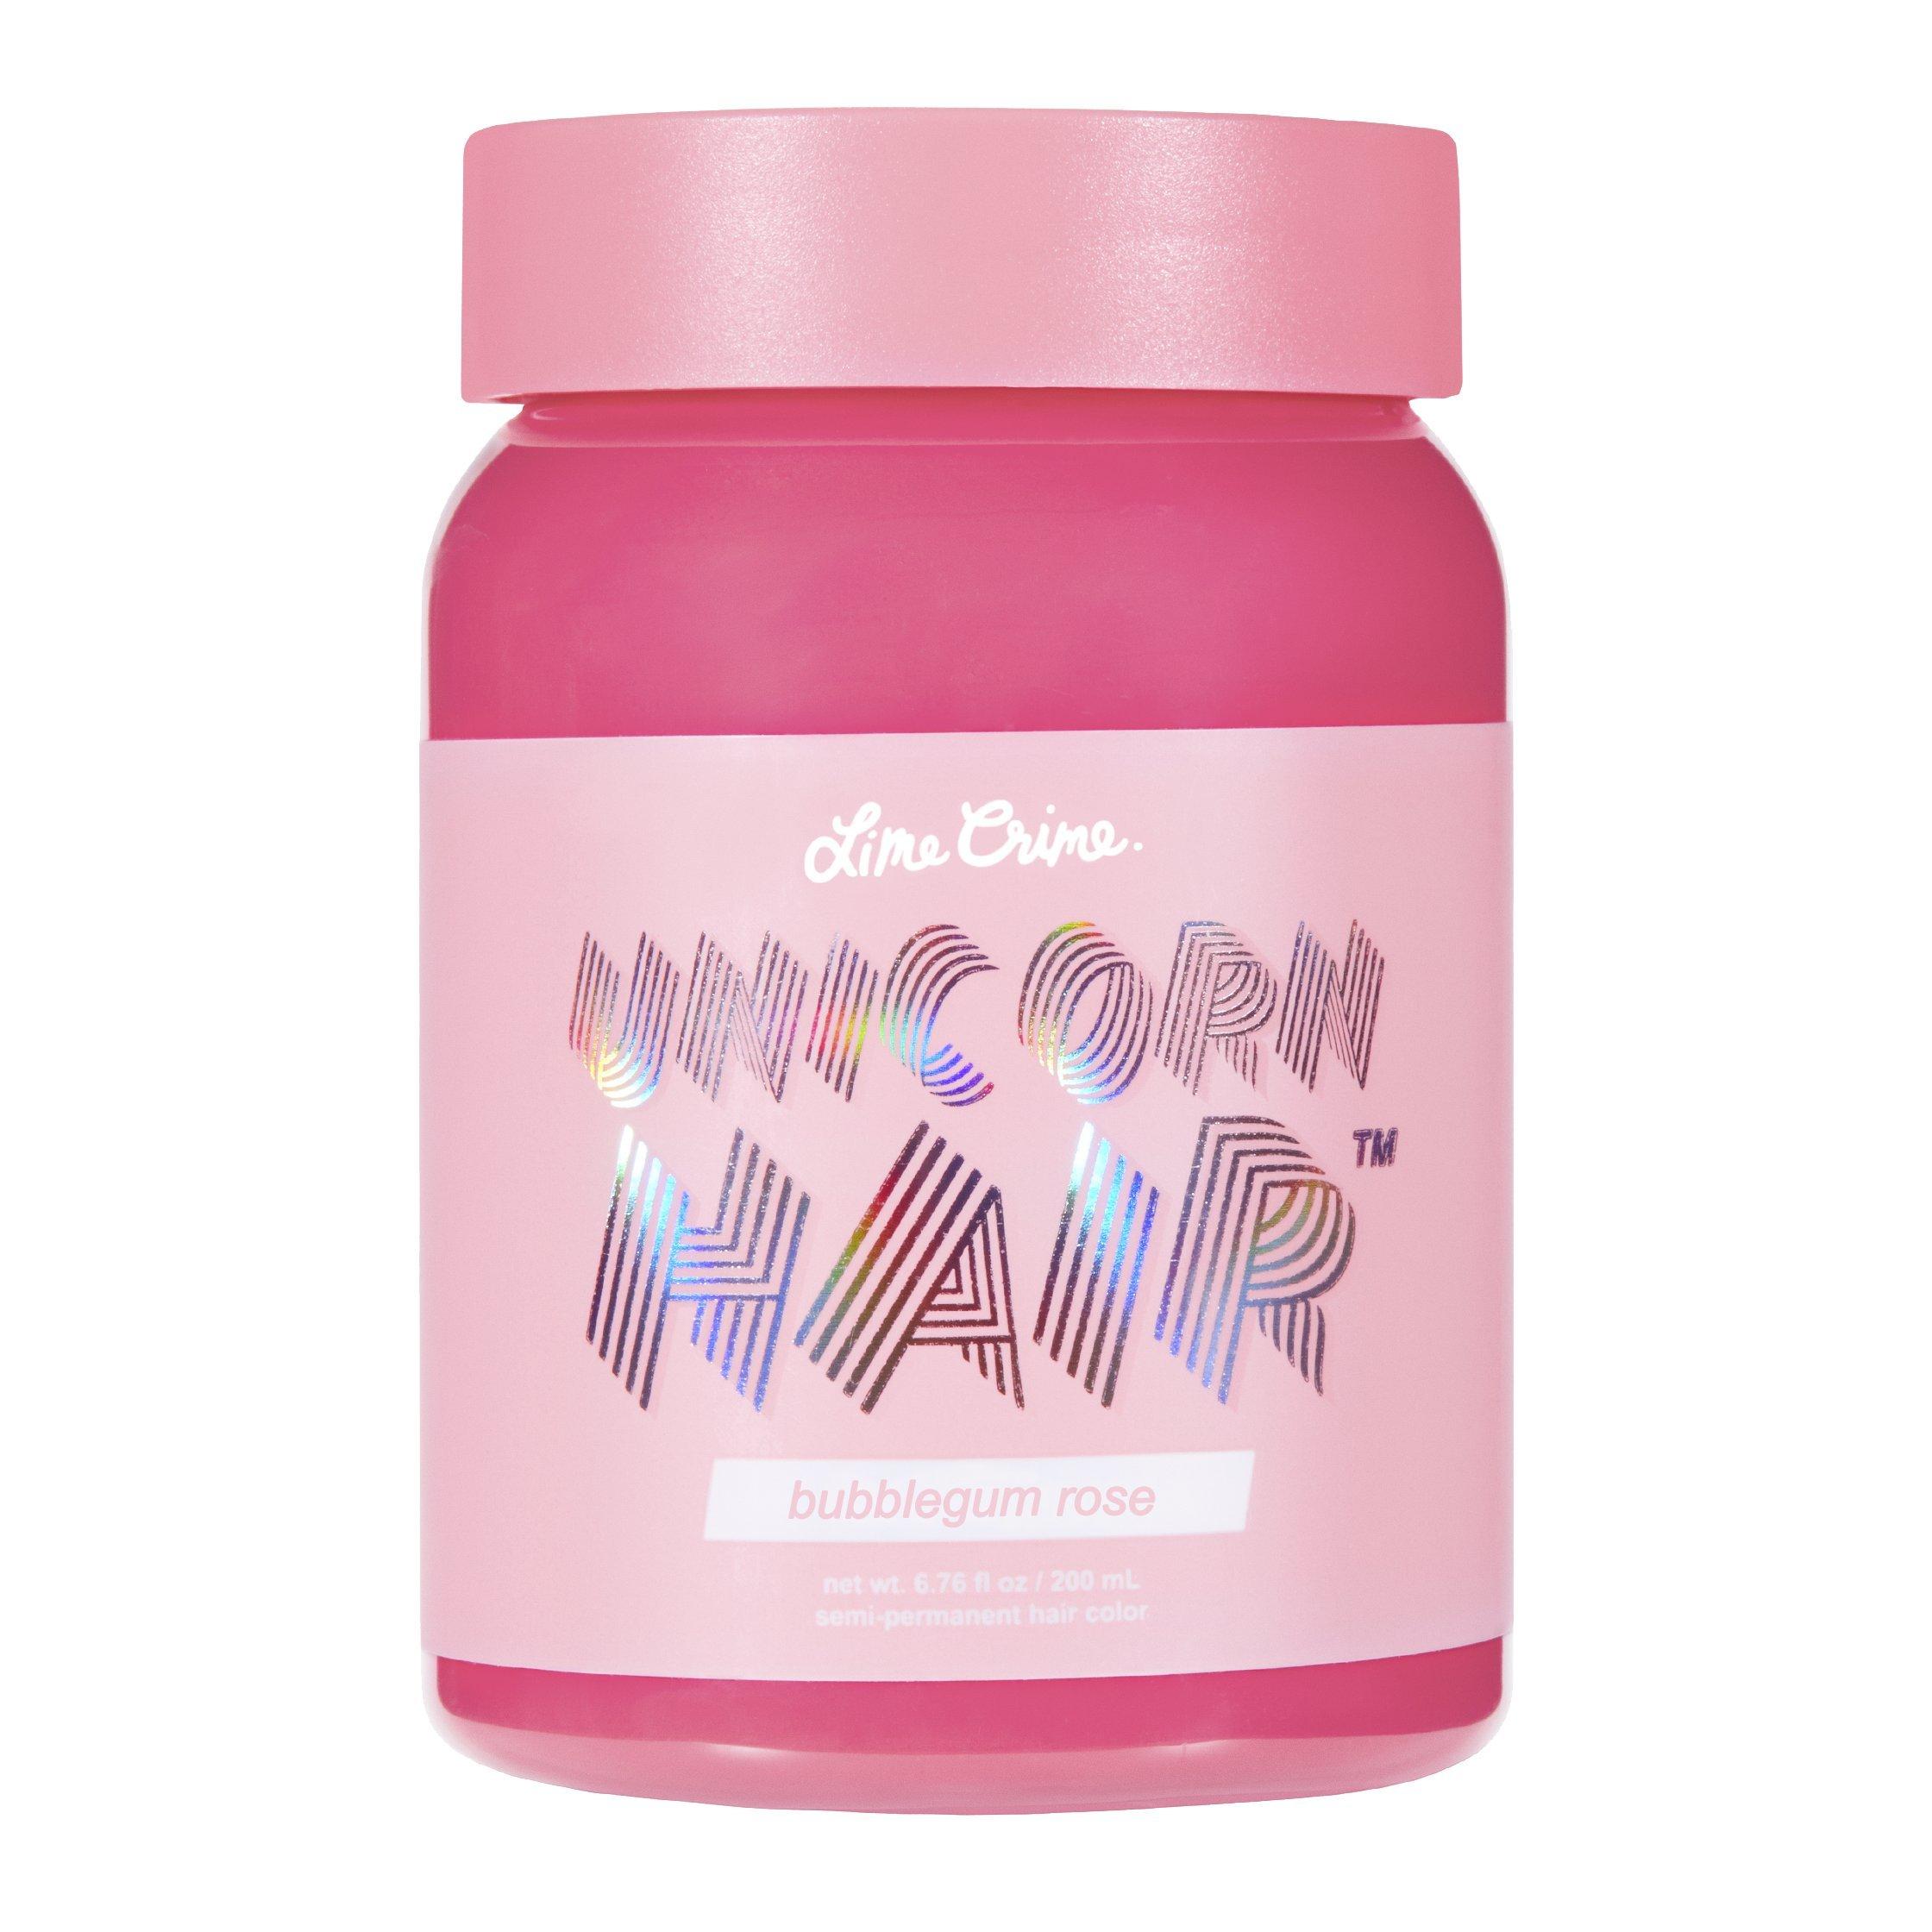 Lime Crime Unicorn Hair Bubblegum Rose (Full Coverage). Semi Permanent Hair Dye. Warm Rose Pink Vegan Hair Color (6.76 fl oz/200 mL).